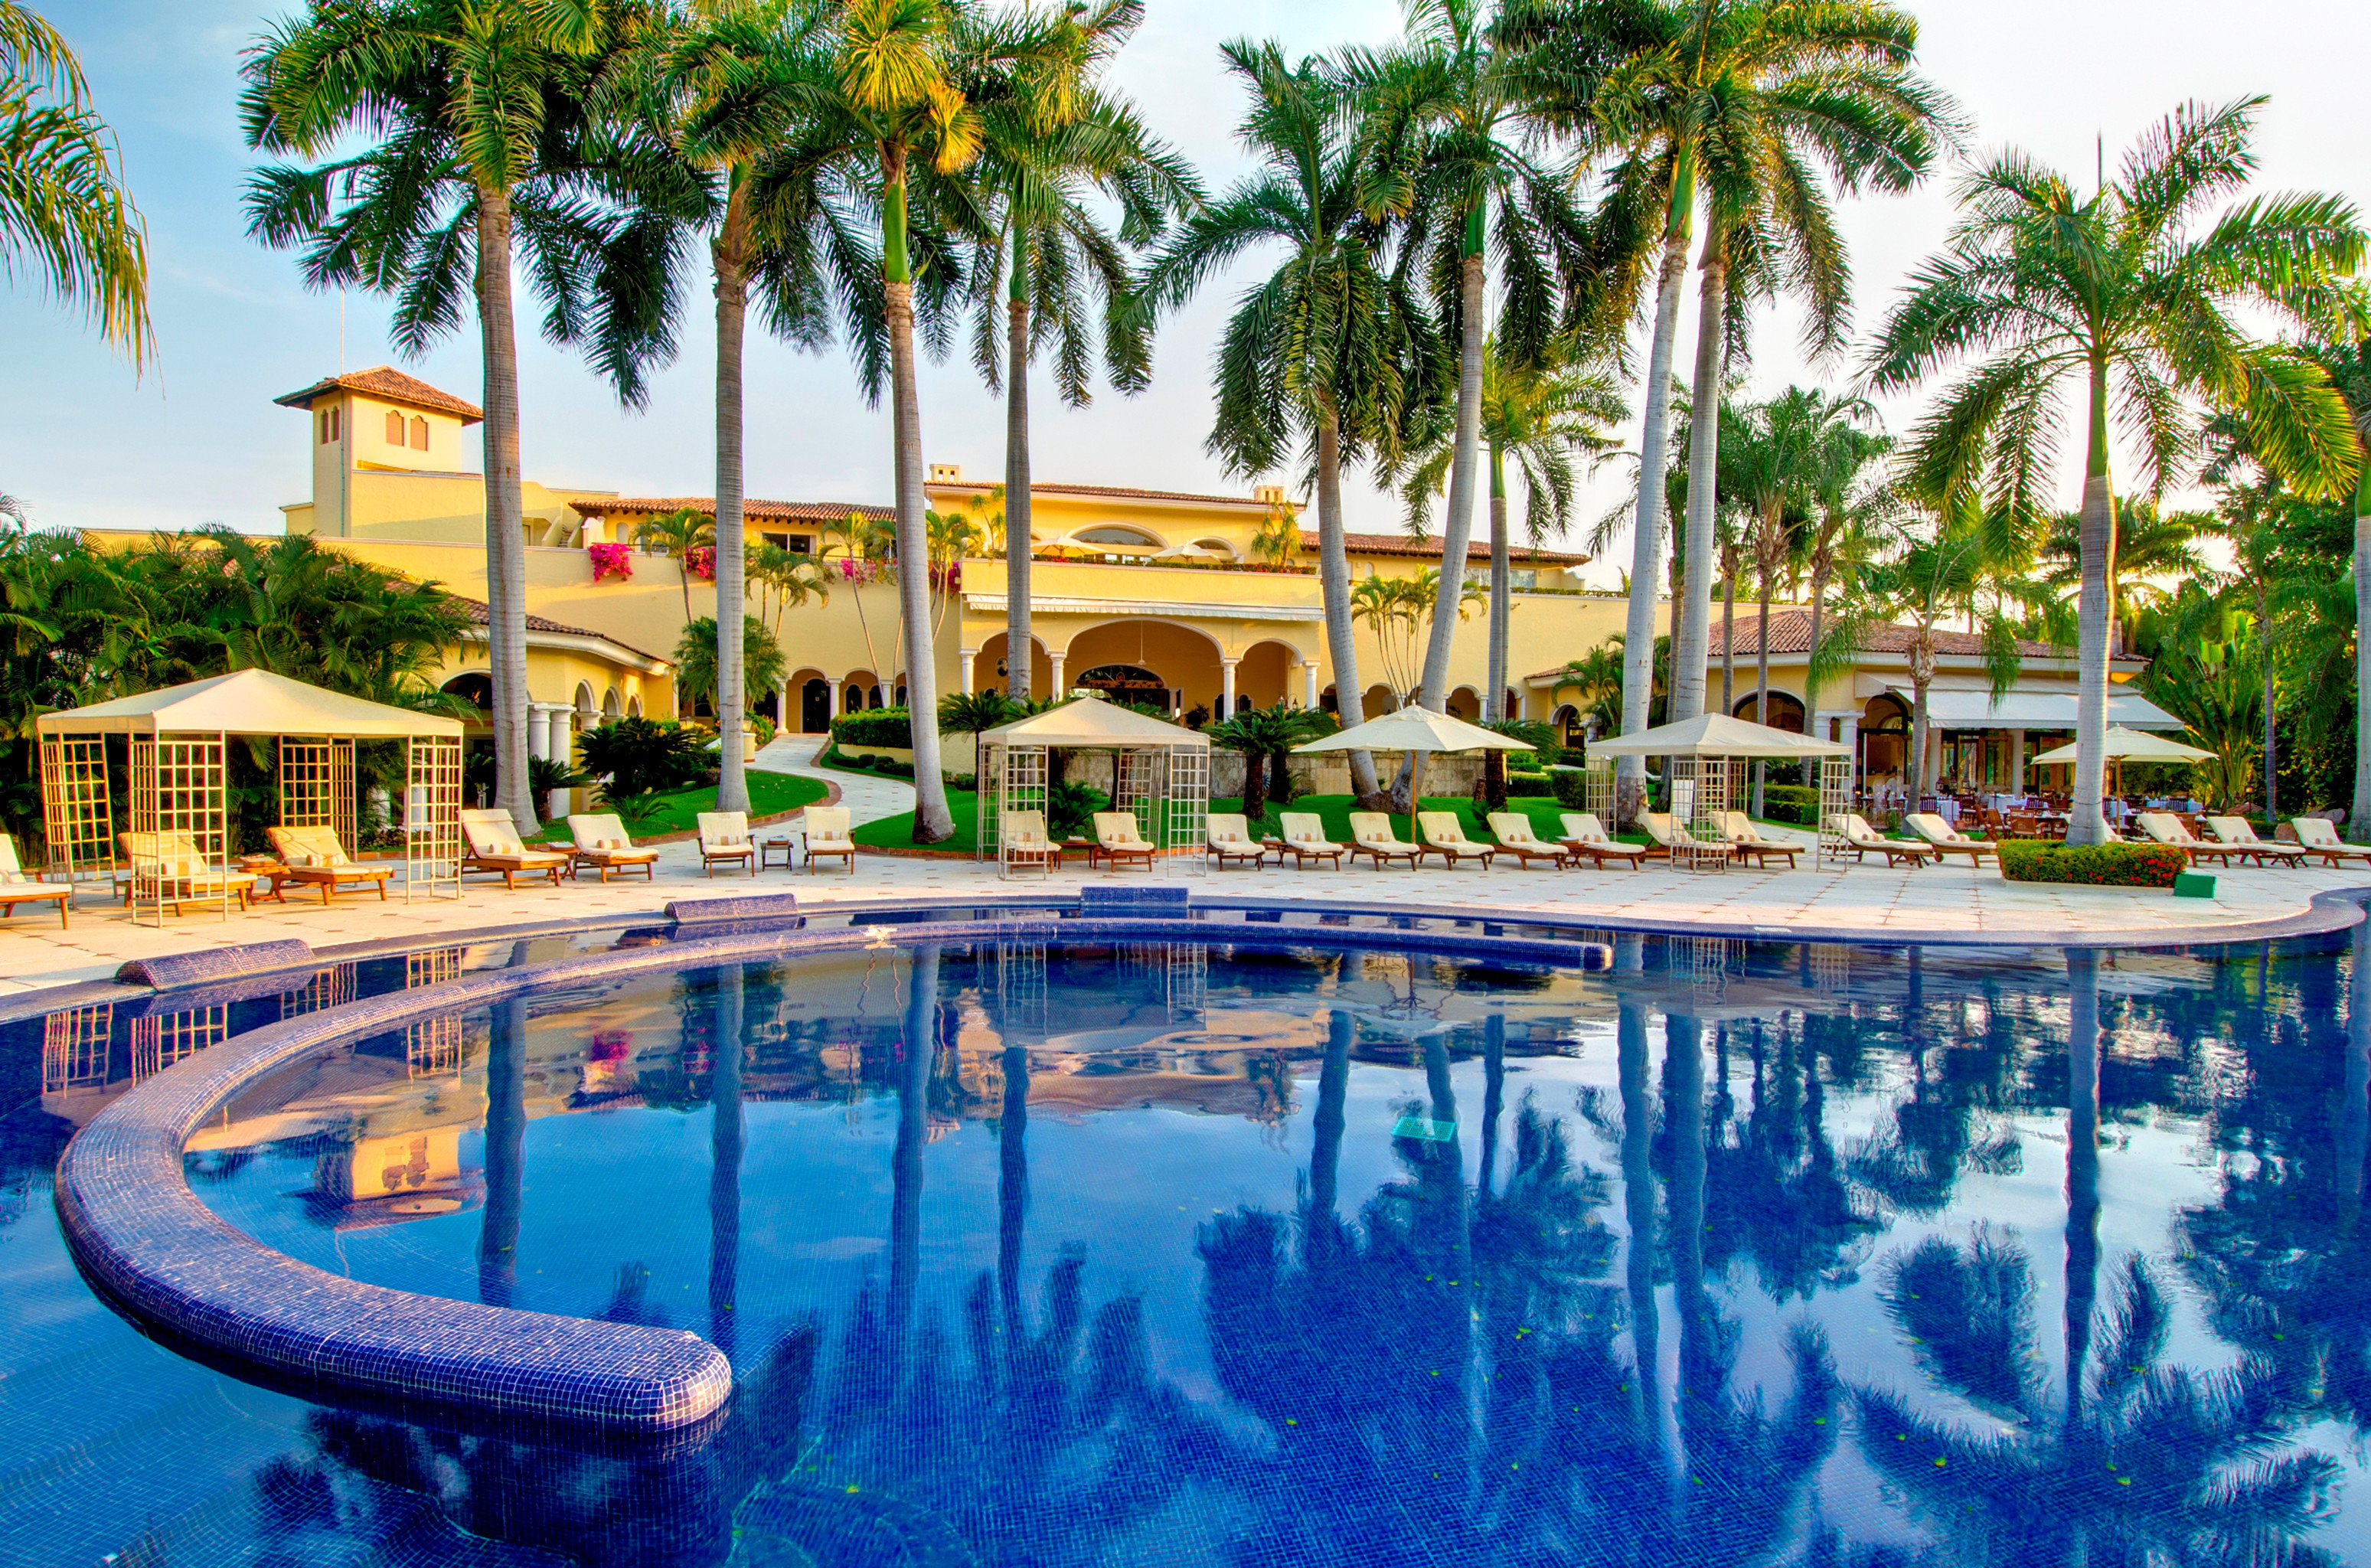 All-Inclusive Resorts Elegant Hotels Lounge Luxury Modern Pool tree sky Resort swimming pool leisure property palm condominium resort town mansion lined